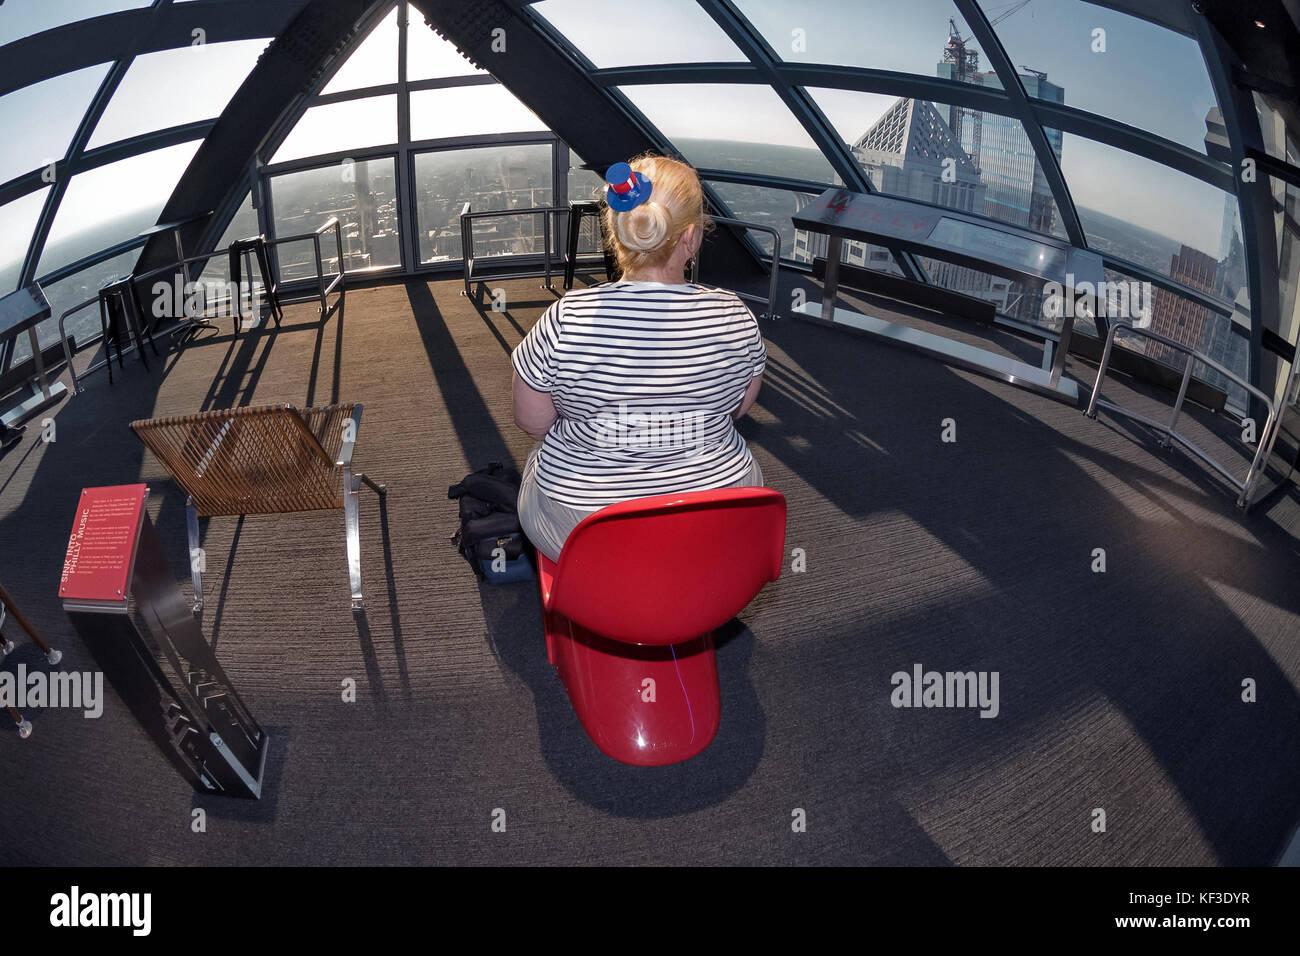 Tourist woman sitting on red chair, One Liberty Observation Deck,  Philadelphia, Pennsylvania, USA,  Philadelphia, - Stock Image